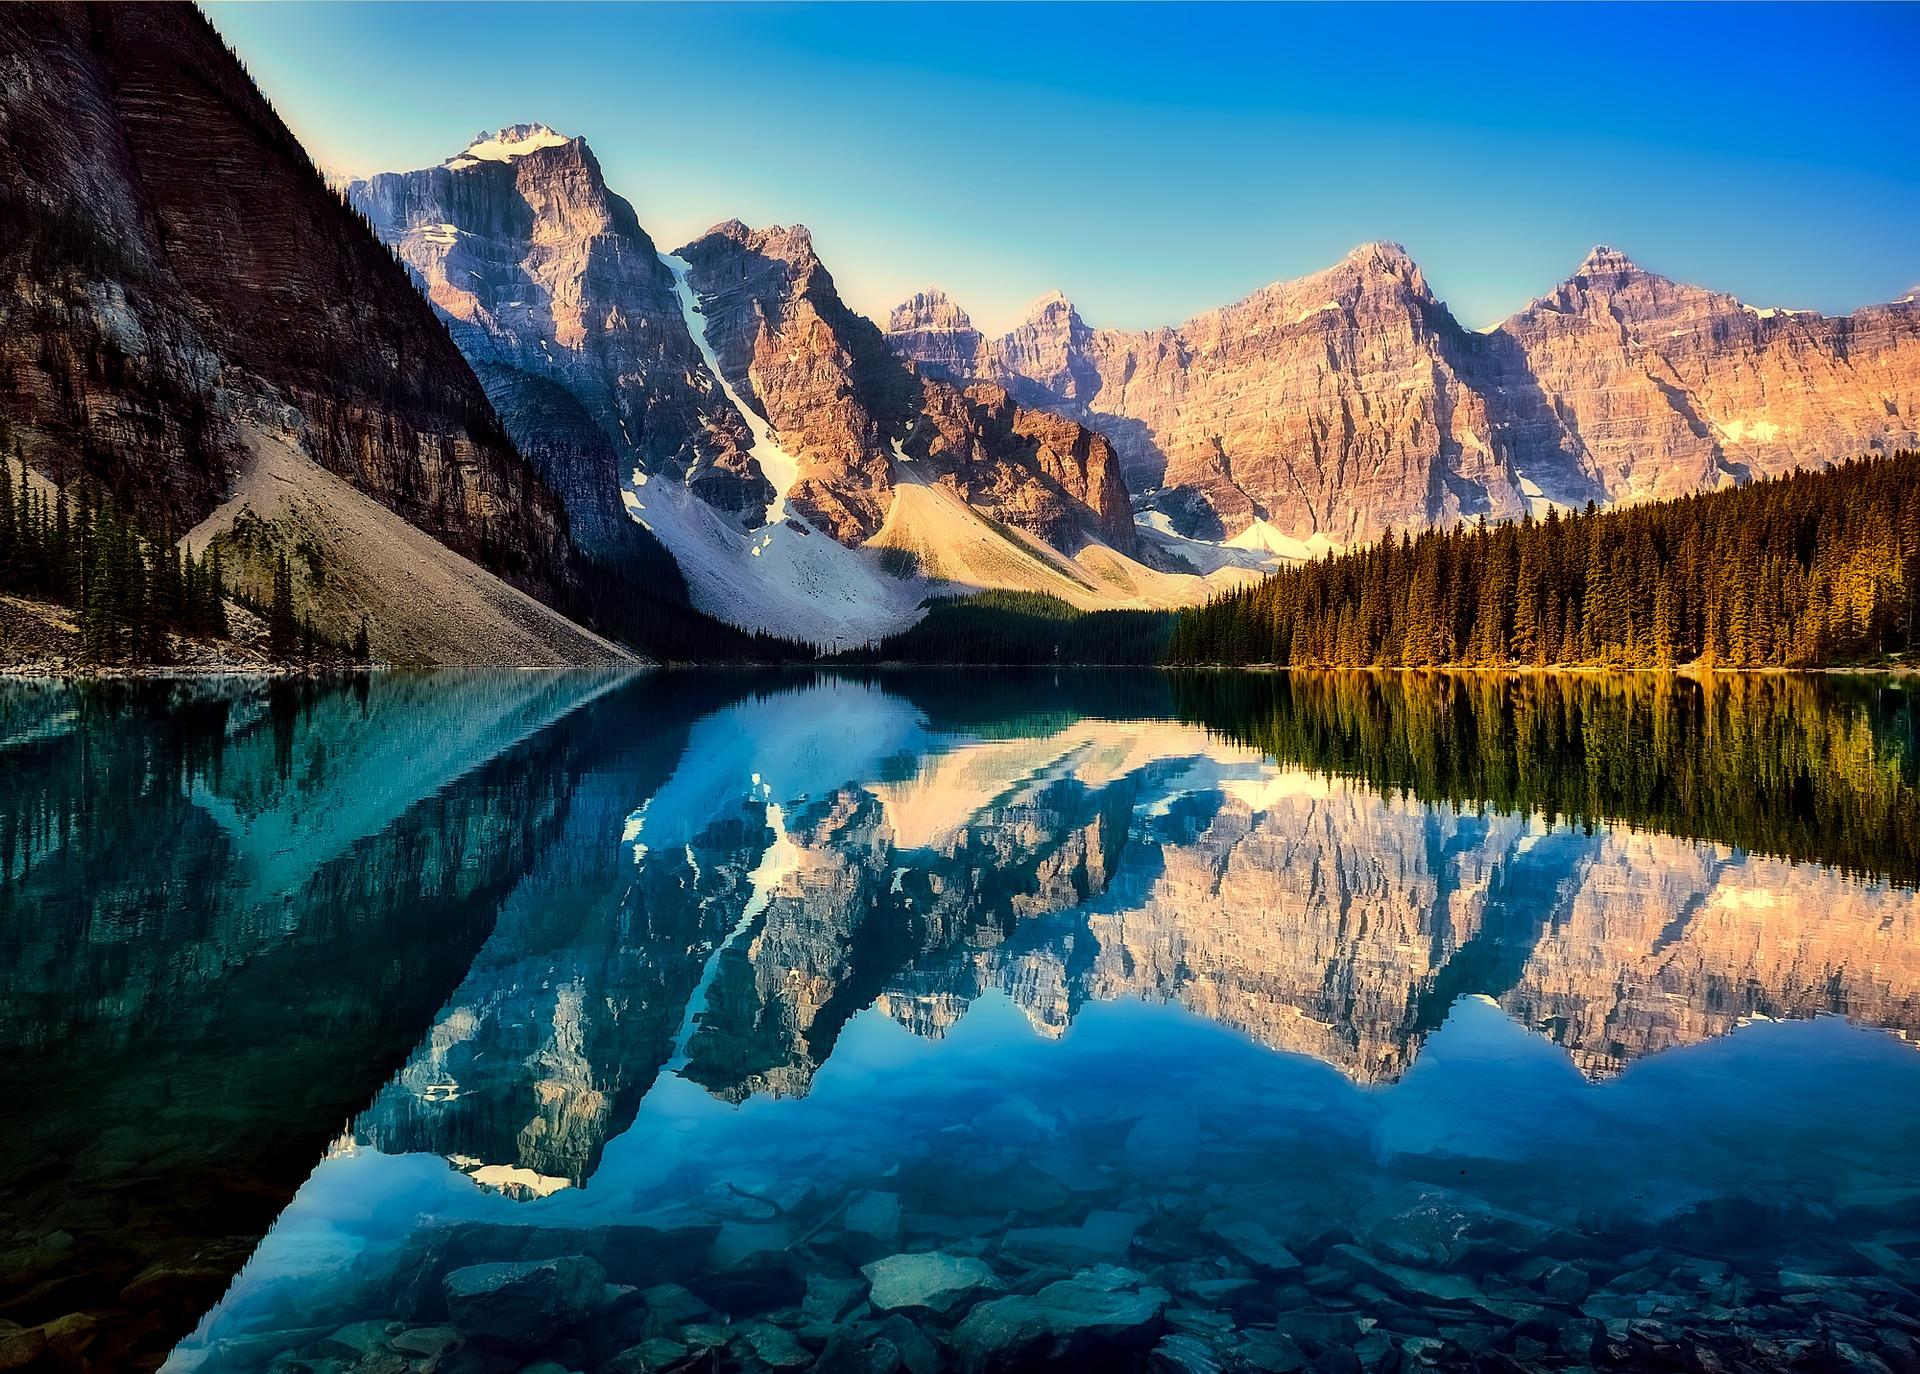 Lac_Moraine_Canada_CC0.jpg?1545468698